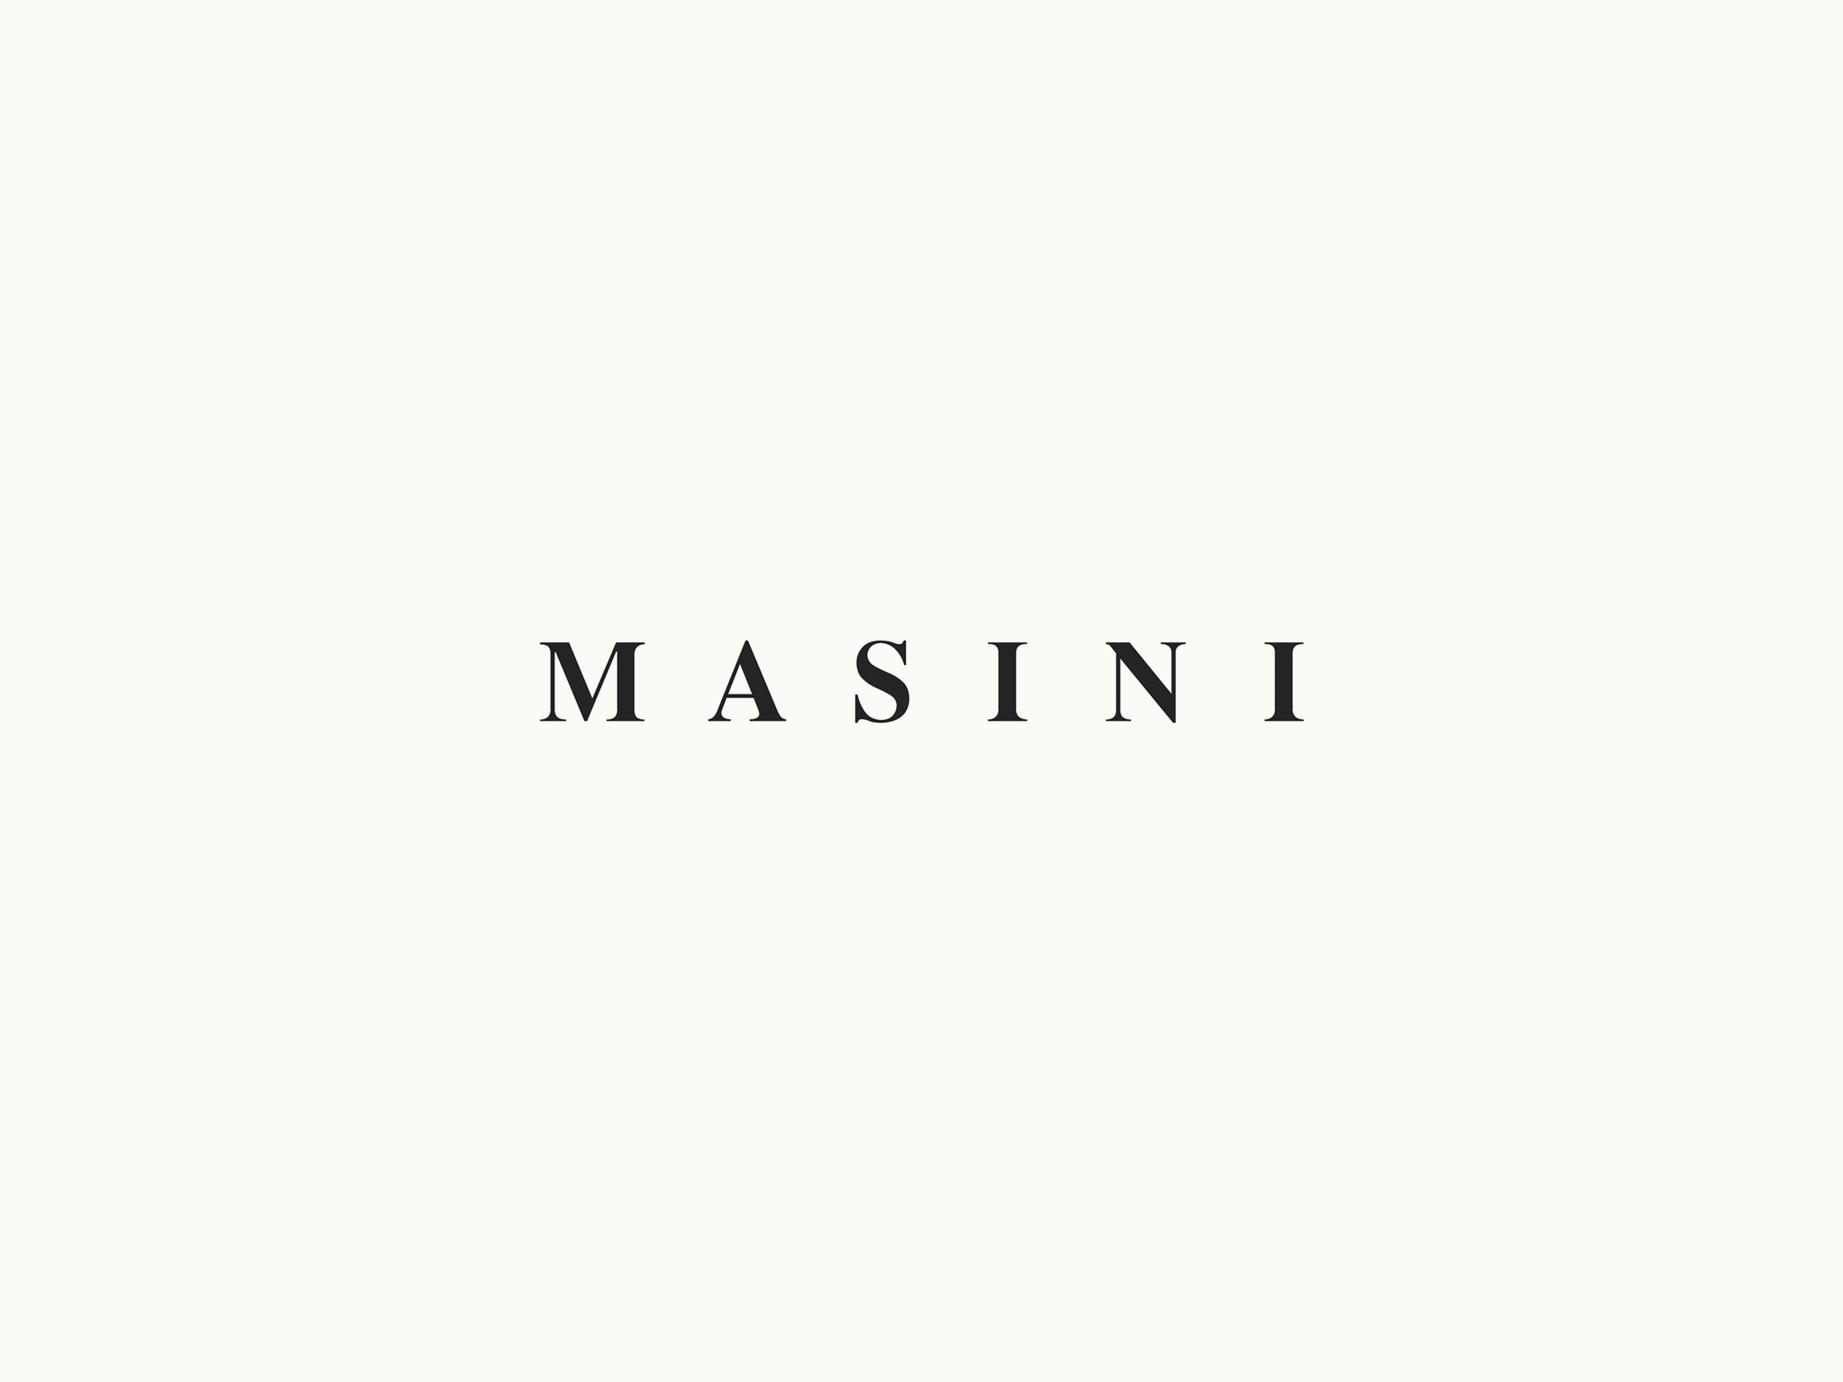 Masini-logo-web-1.jpg